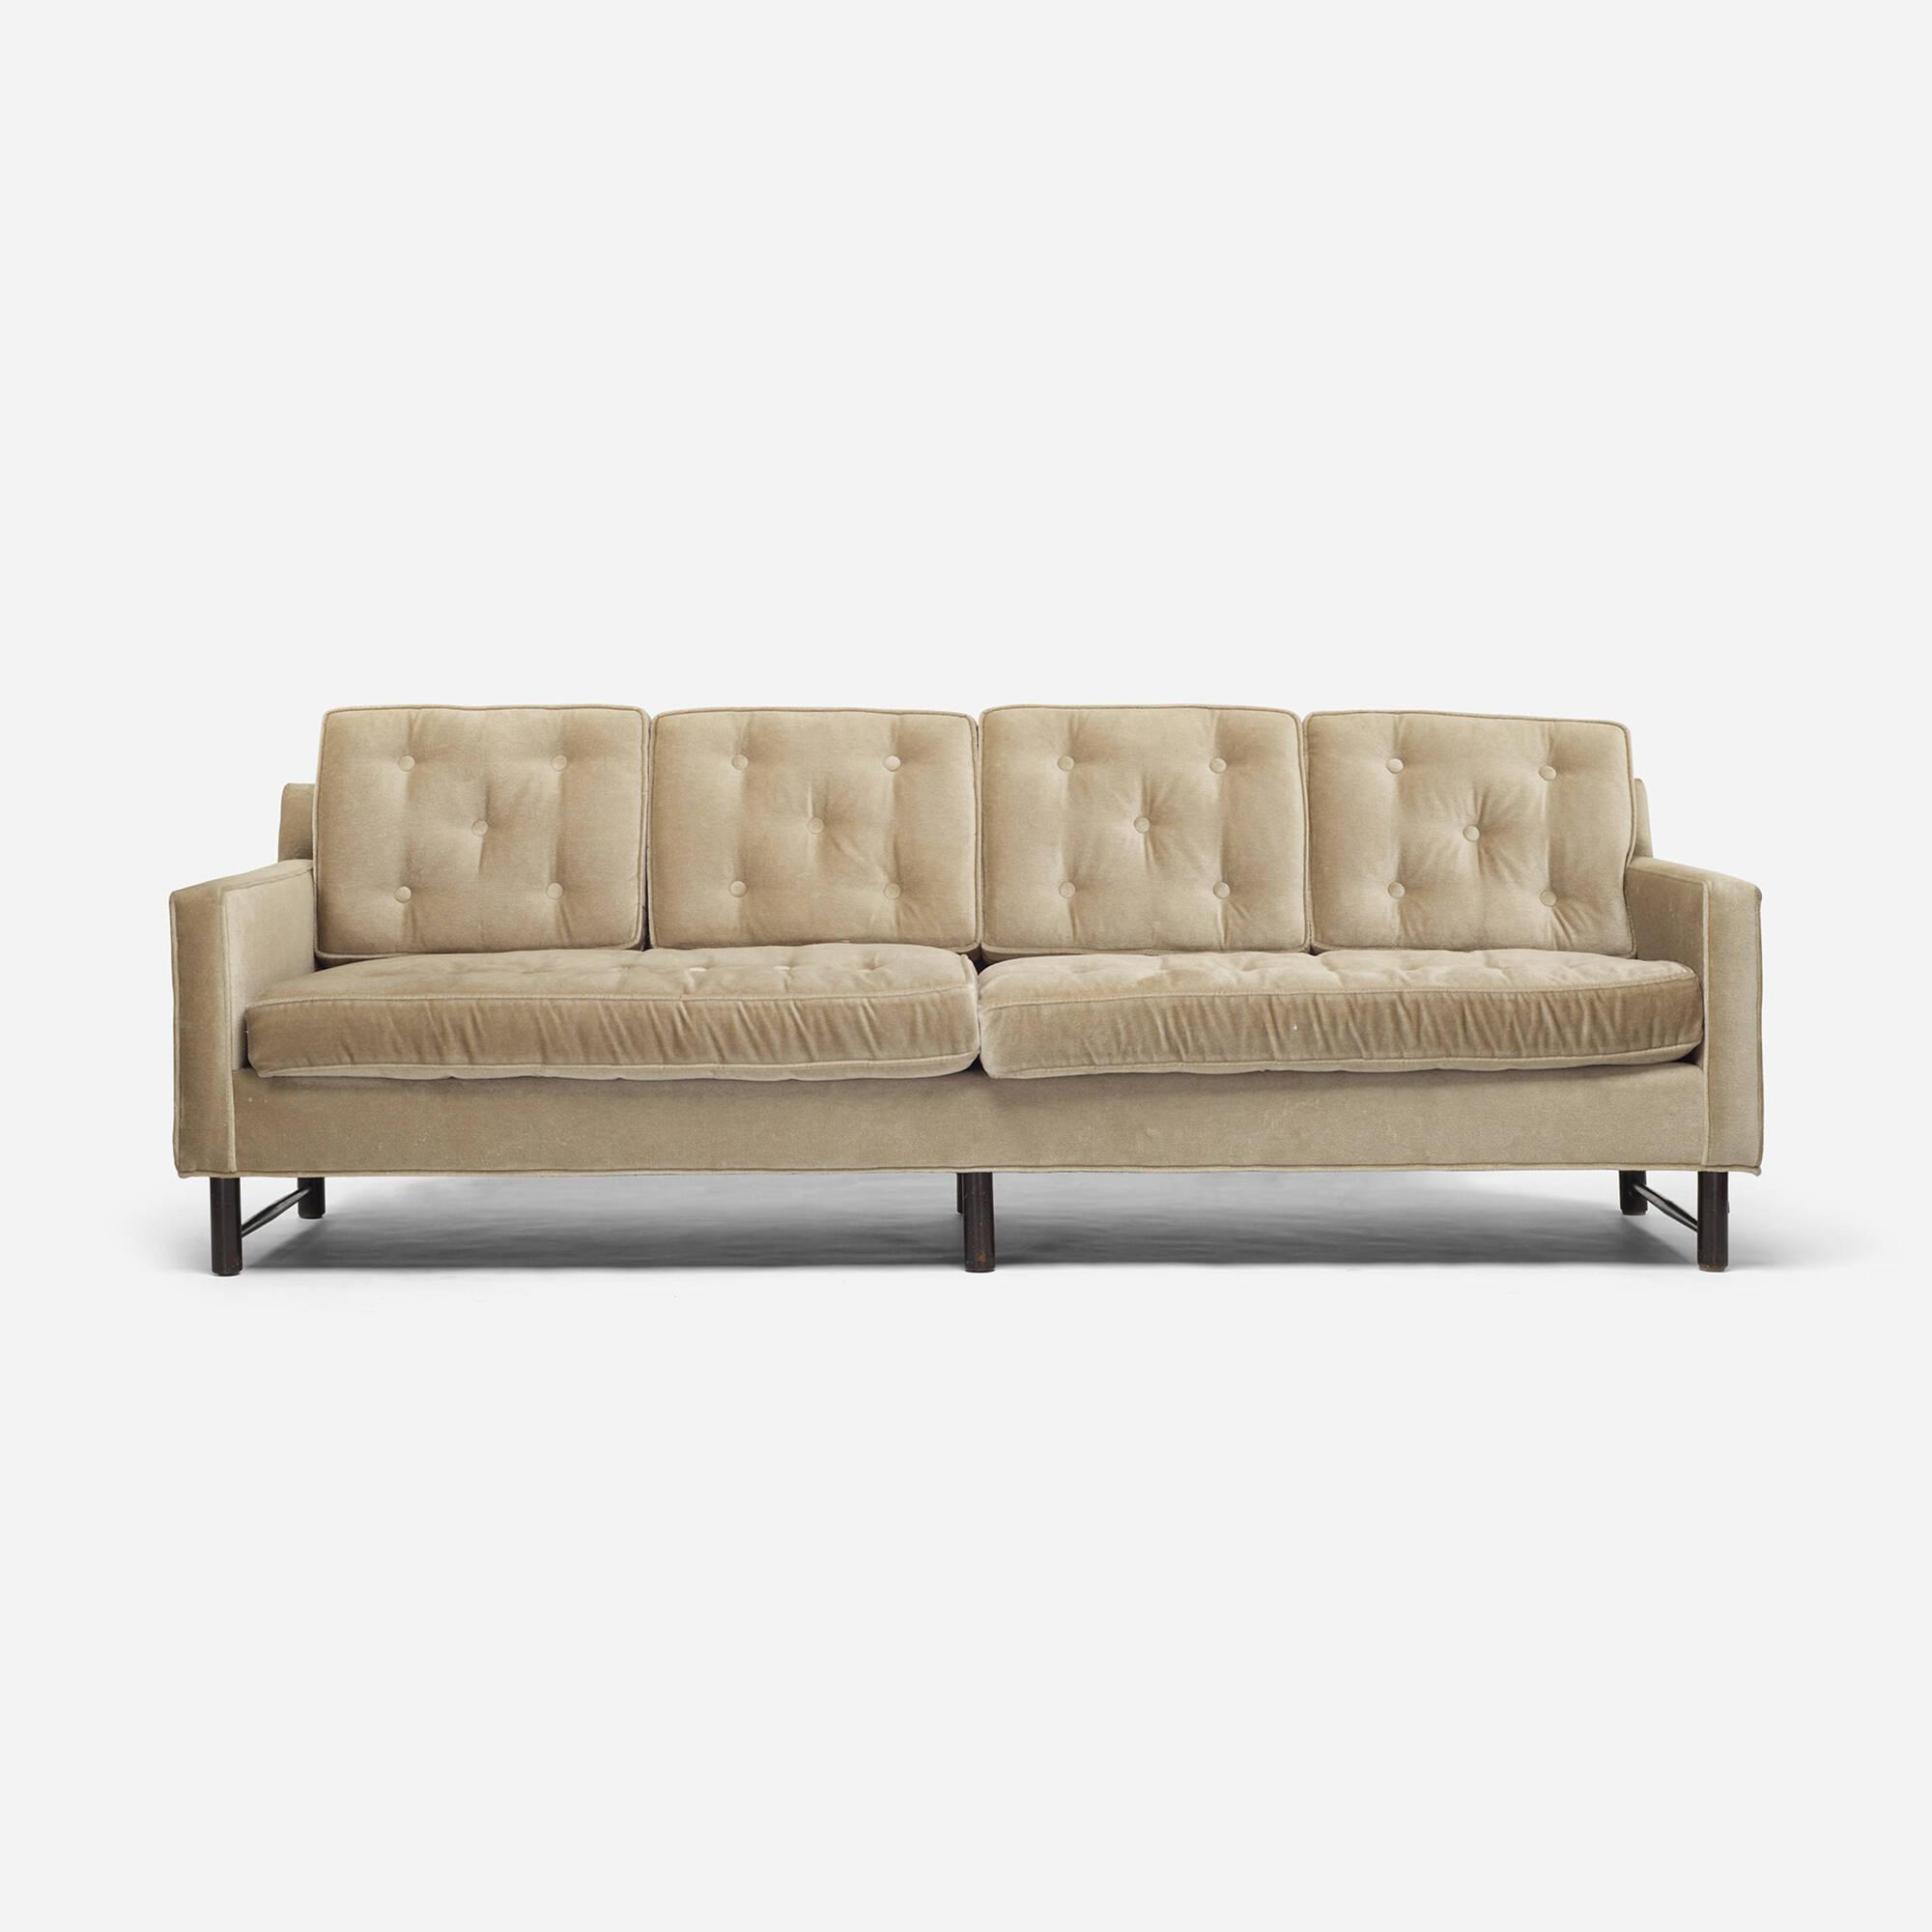 Lovely ... 712: Edward Wormley / Sofa, Model 5138 (2 Of 3)